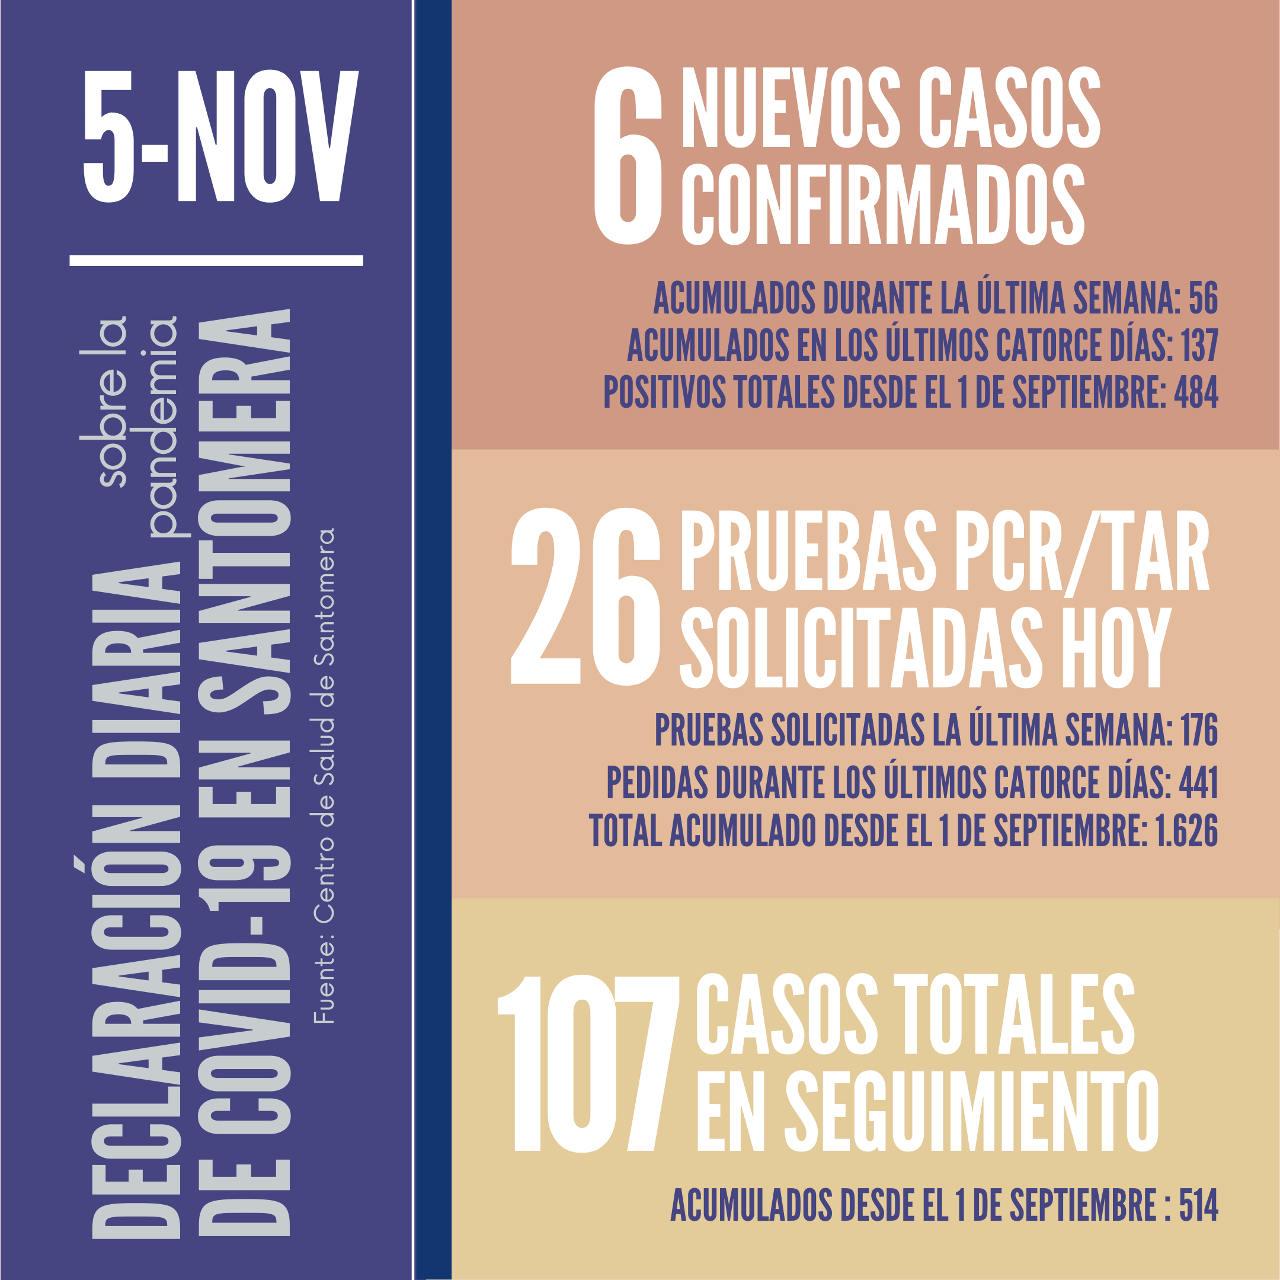 20201105_Datos COVID-19 Santomera